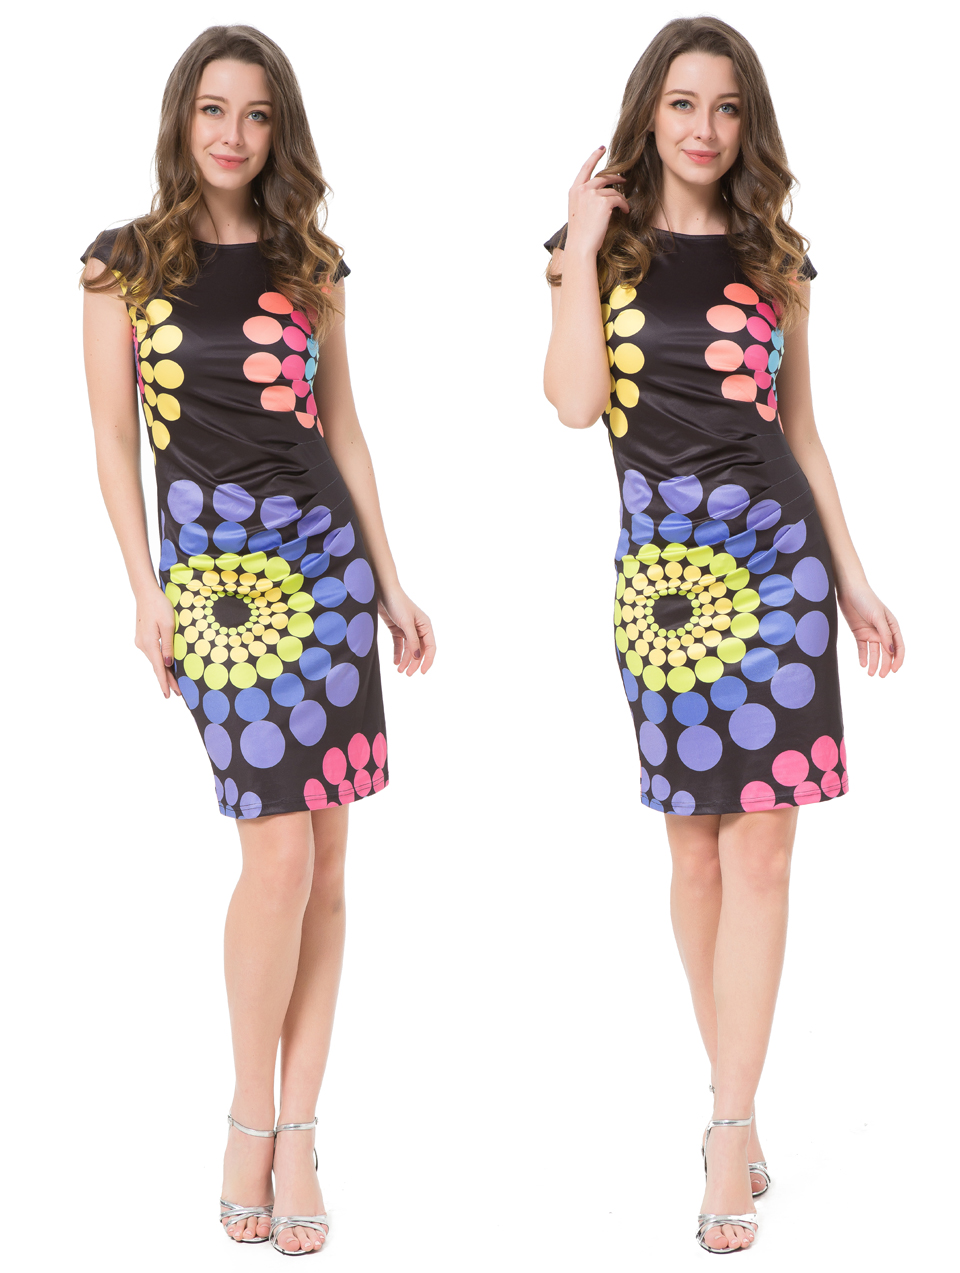 17 Kaige Nina dress Women bodycon dress plus size women clothing chic elegant sexy fashion o-neck print dresses 9026 13